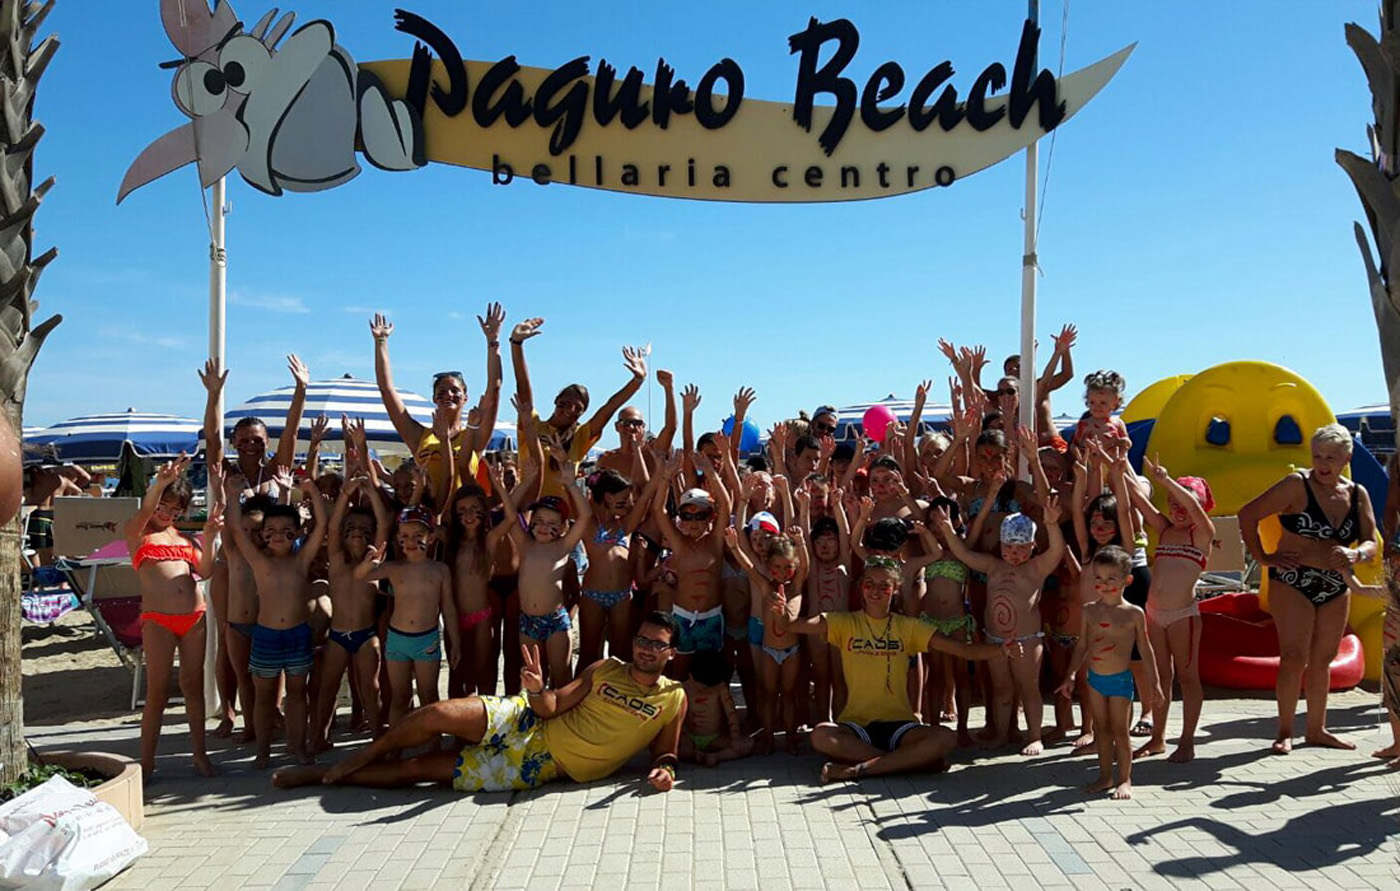 Spiaggia Paguro Beach Bellaria Igea Marina | Hotel Titanus